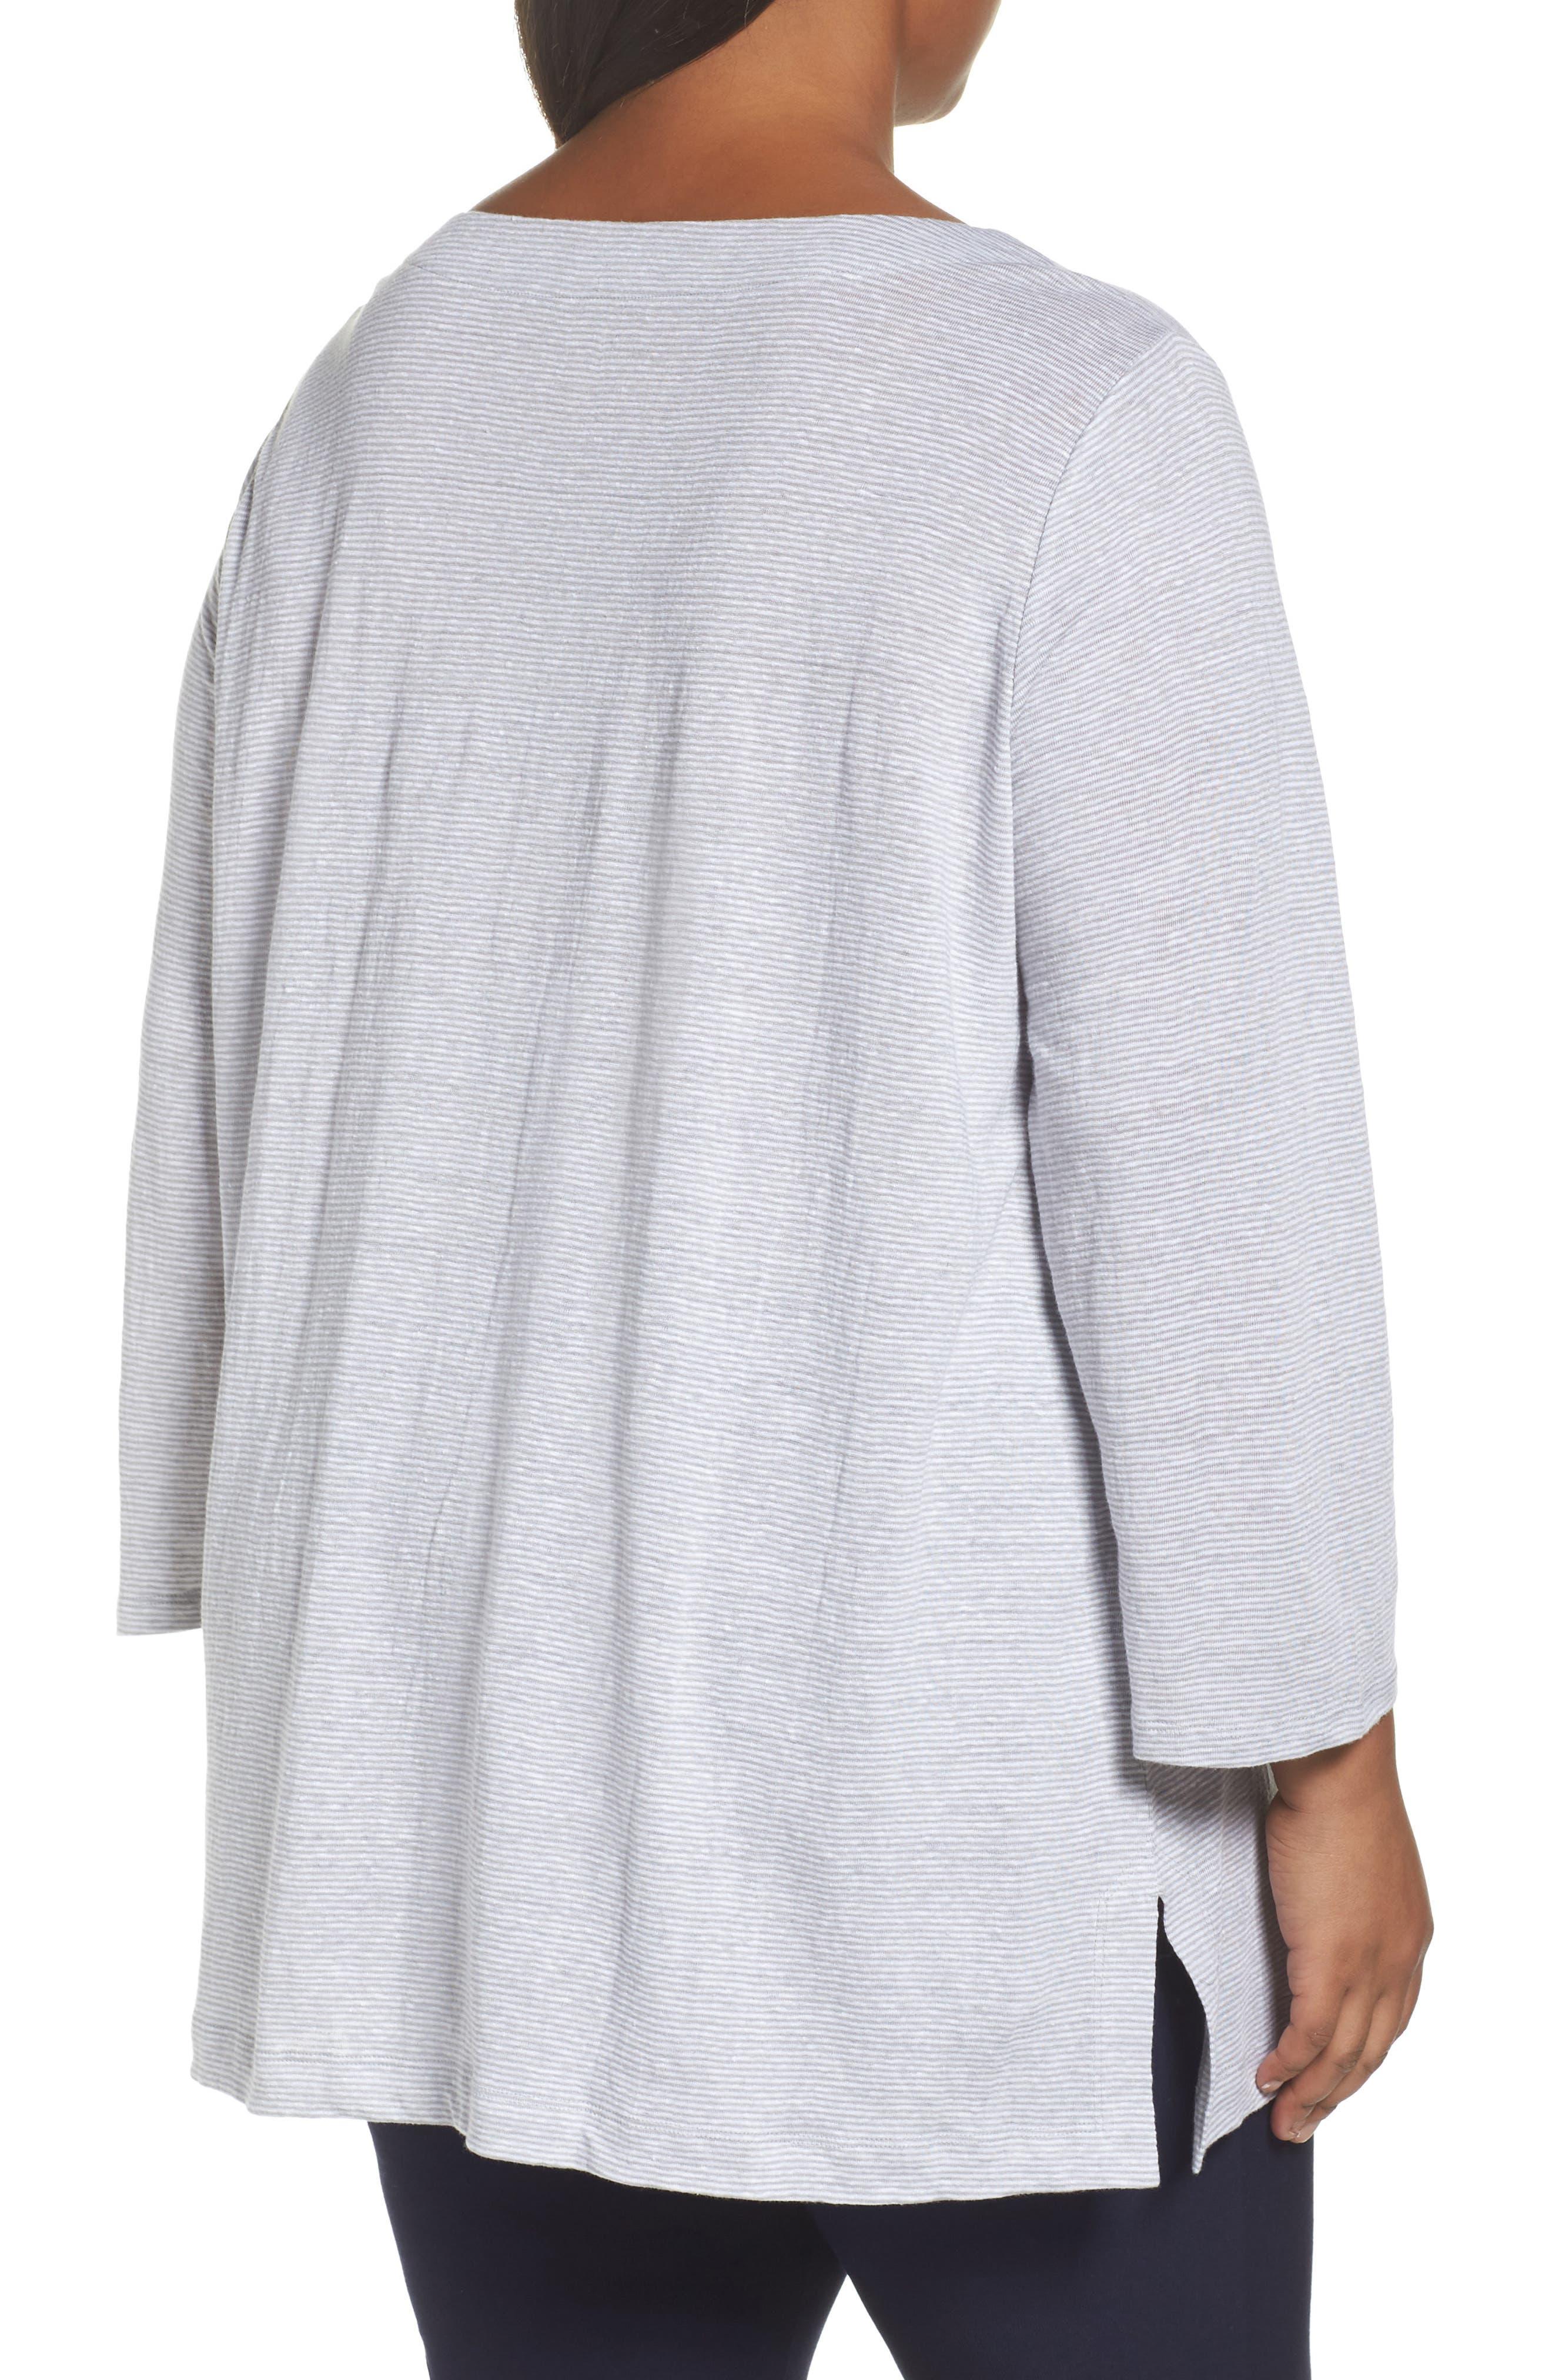 Organic Linen Bateau Neck Top,                             Alternate thumbnail 2, color,                             022